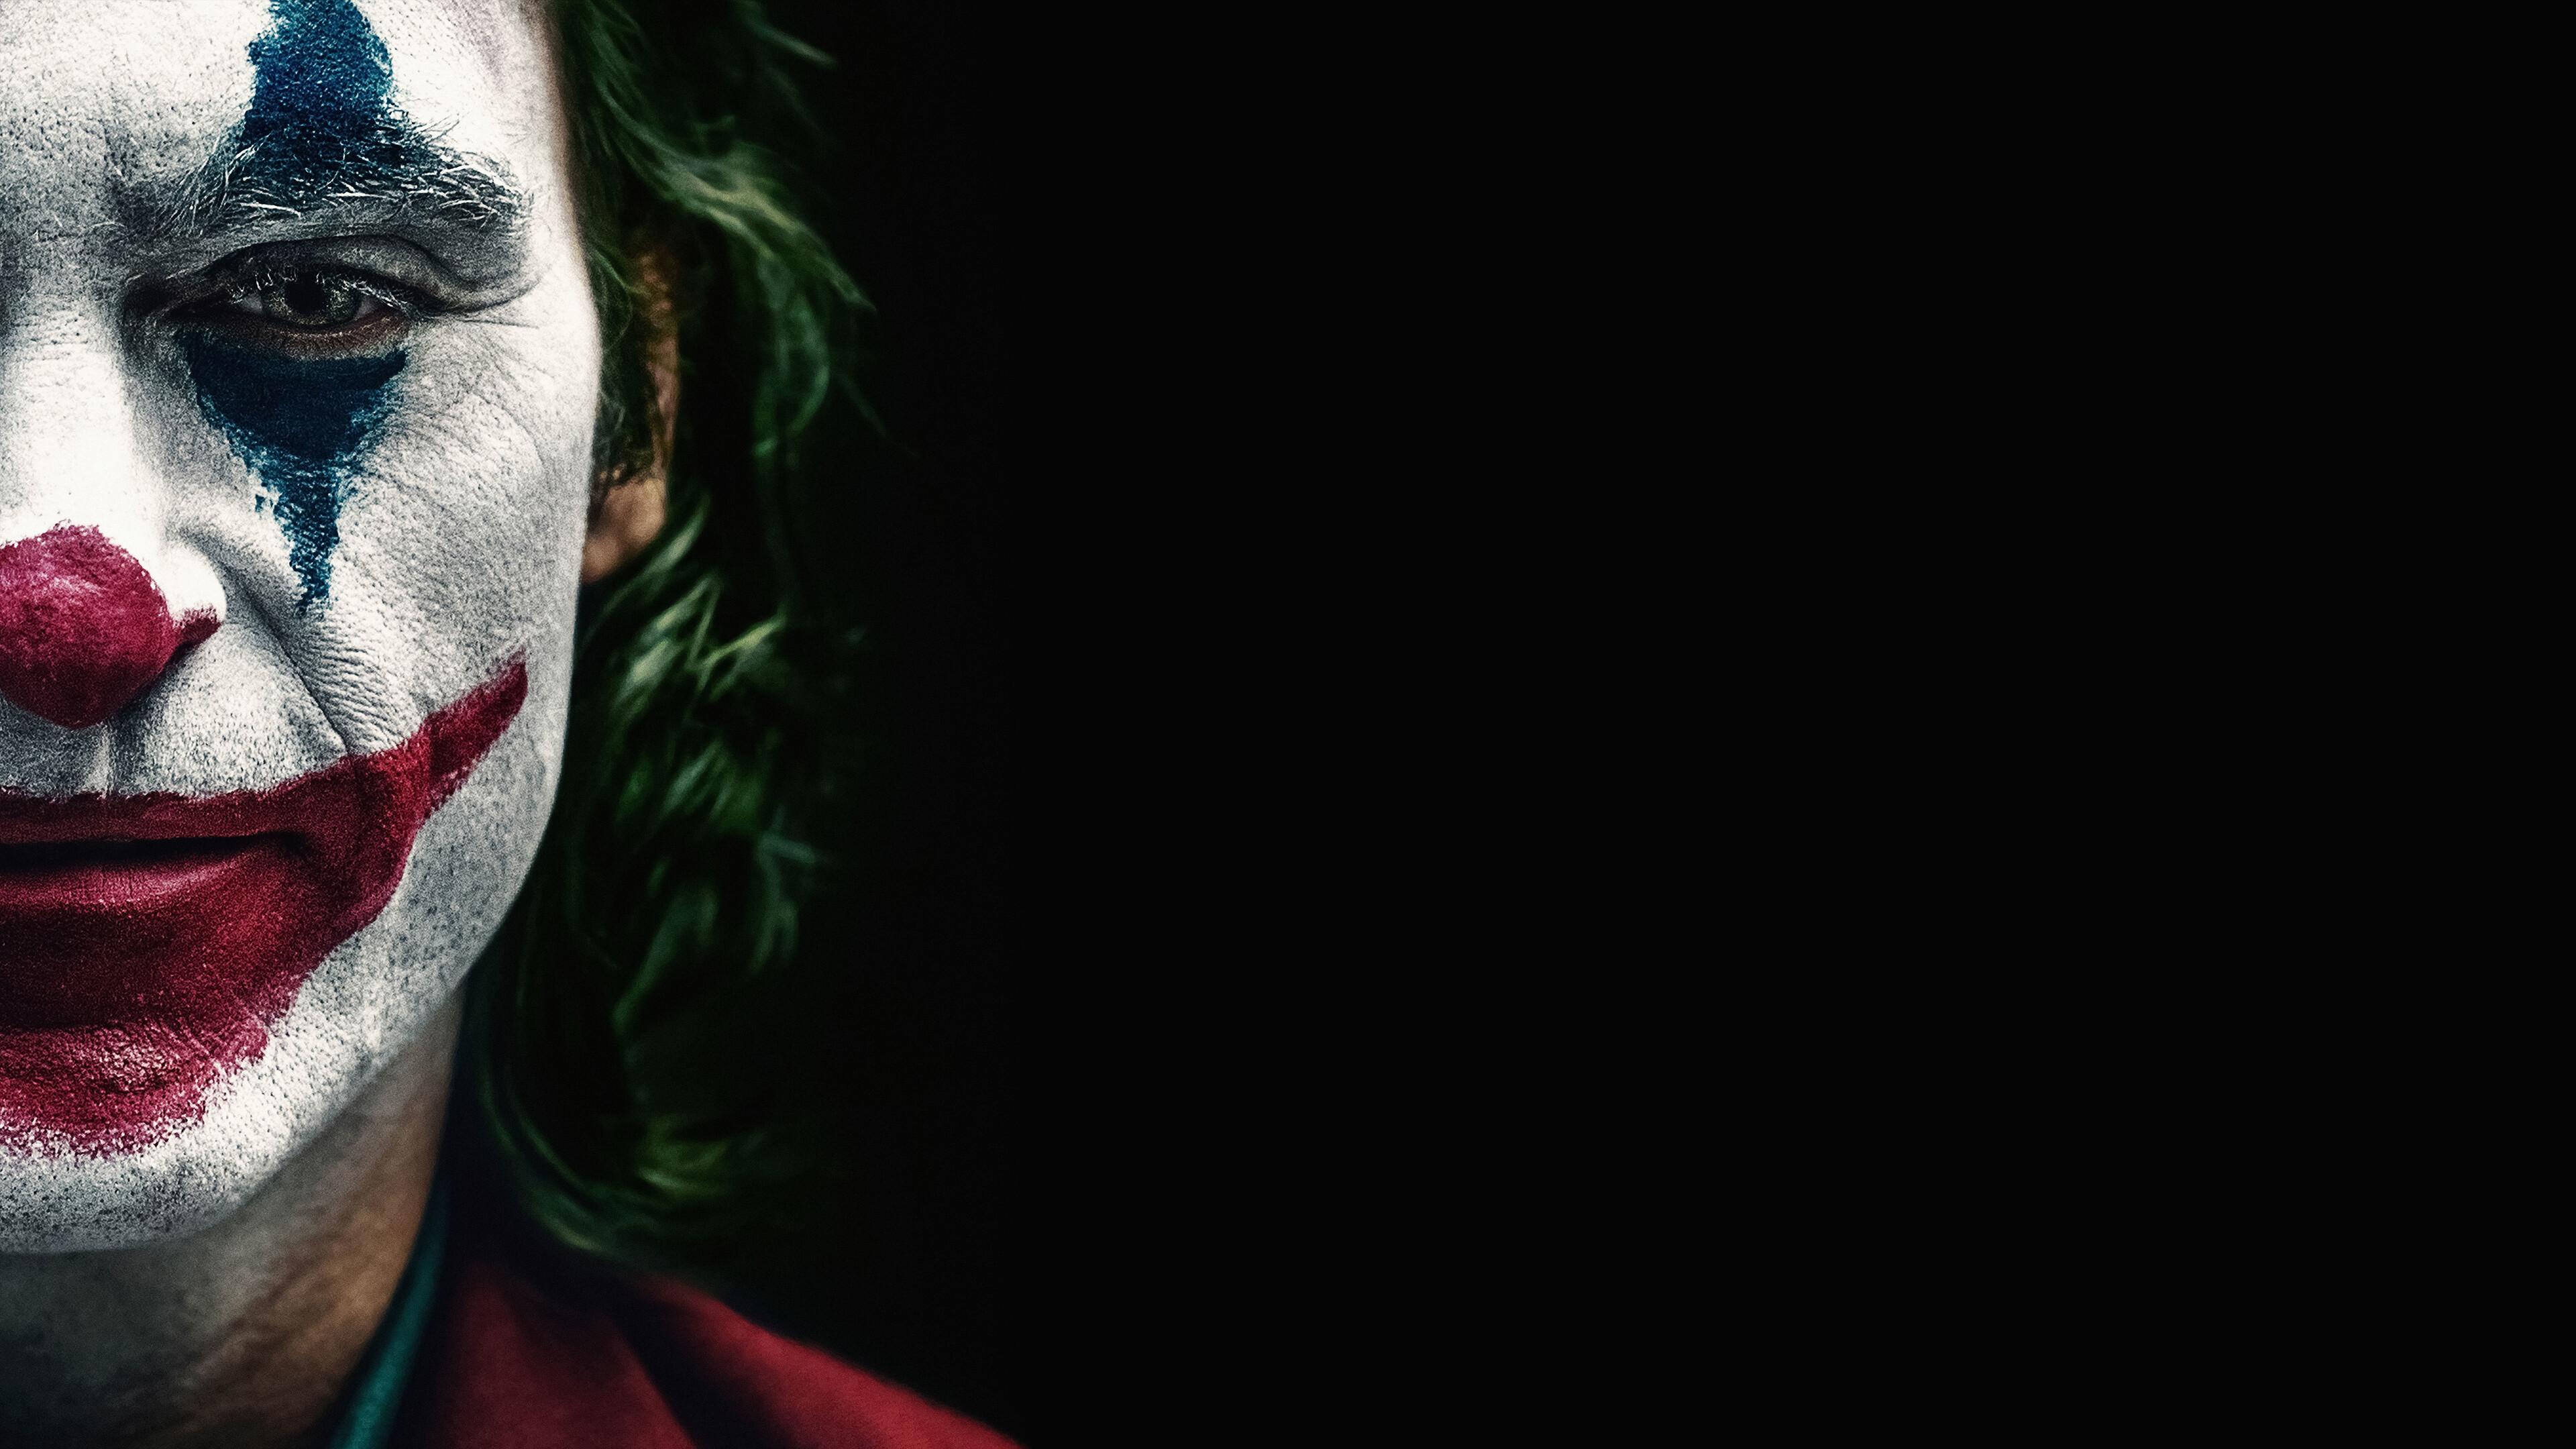 Joker Movie 2019 Clown Hd Movies 4k Wallpapers Images